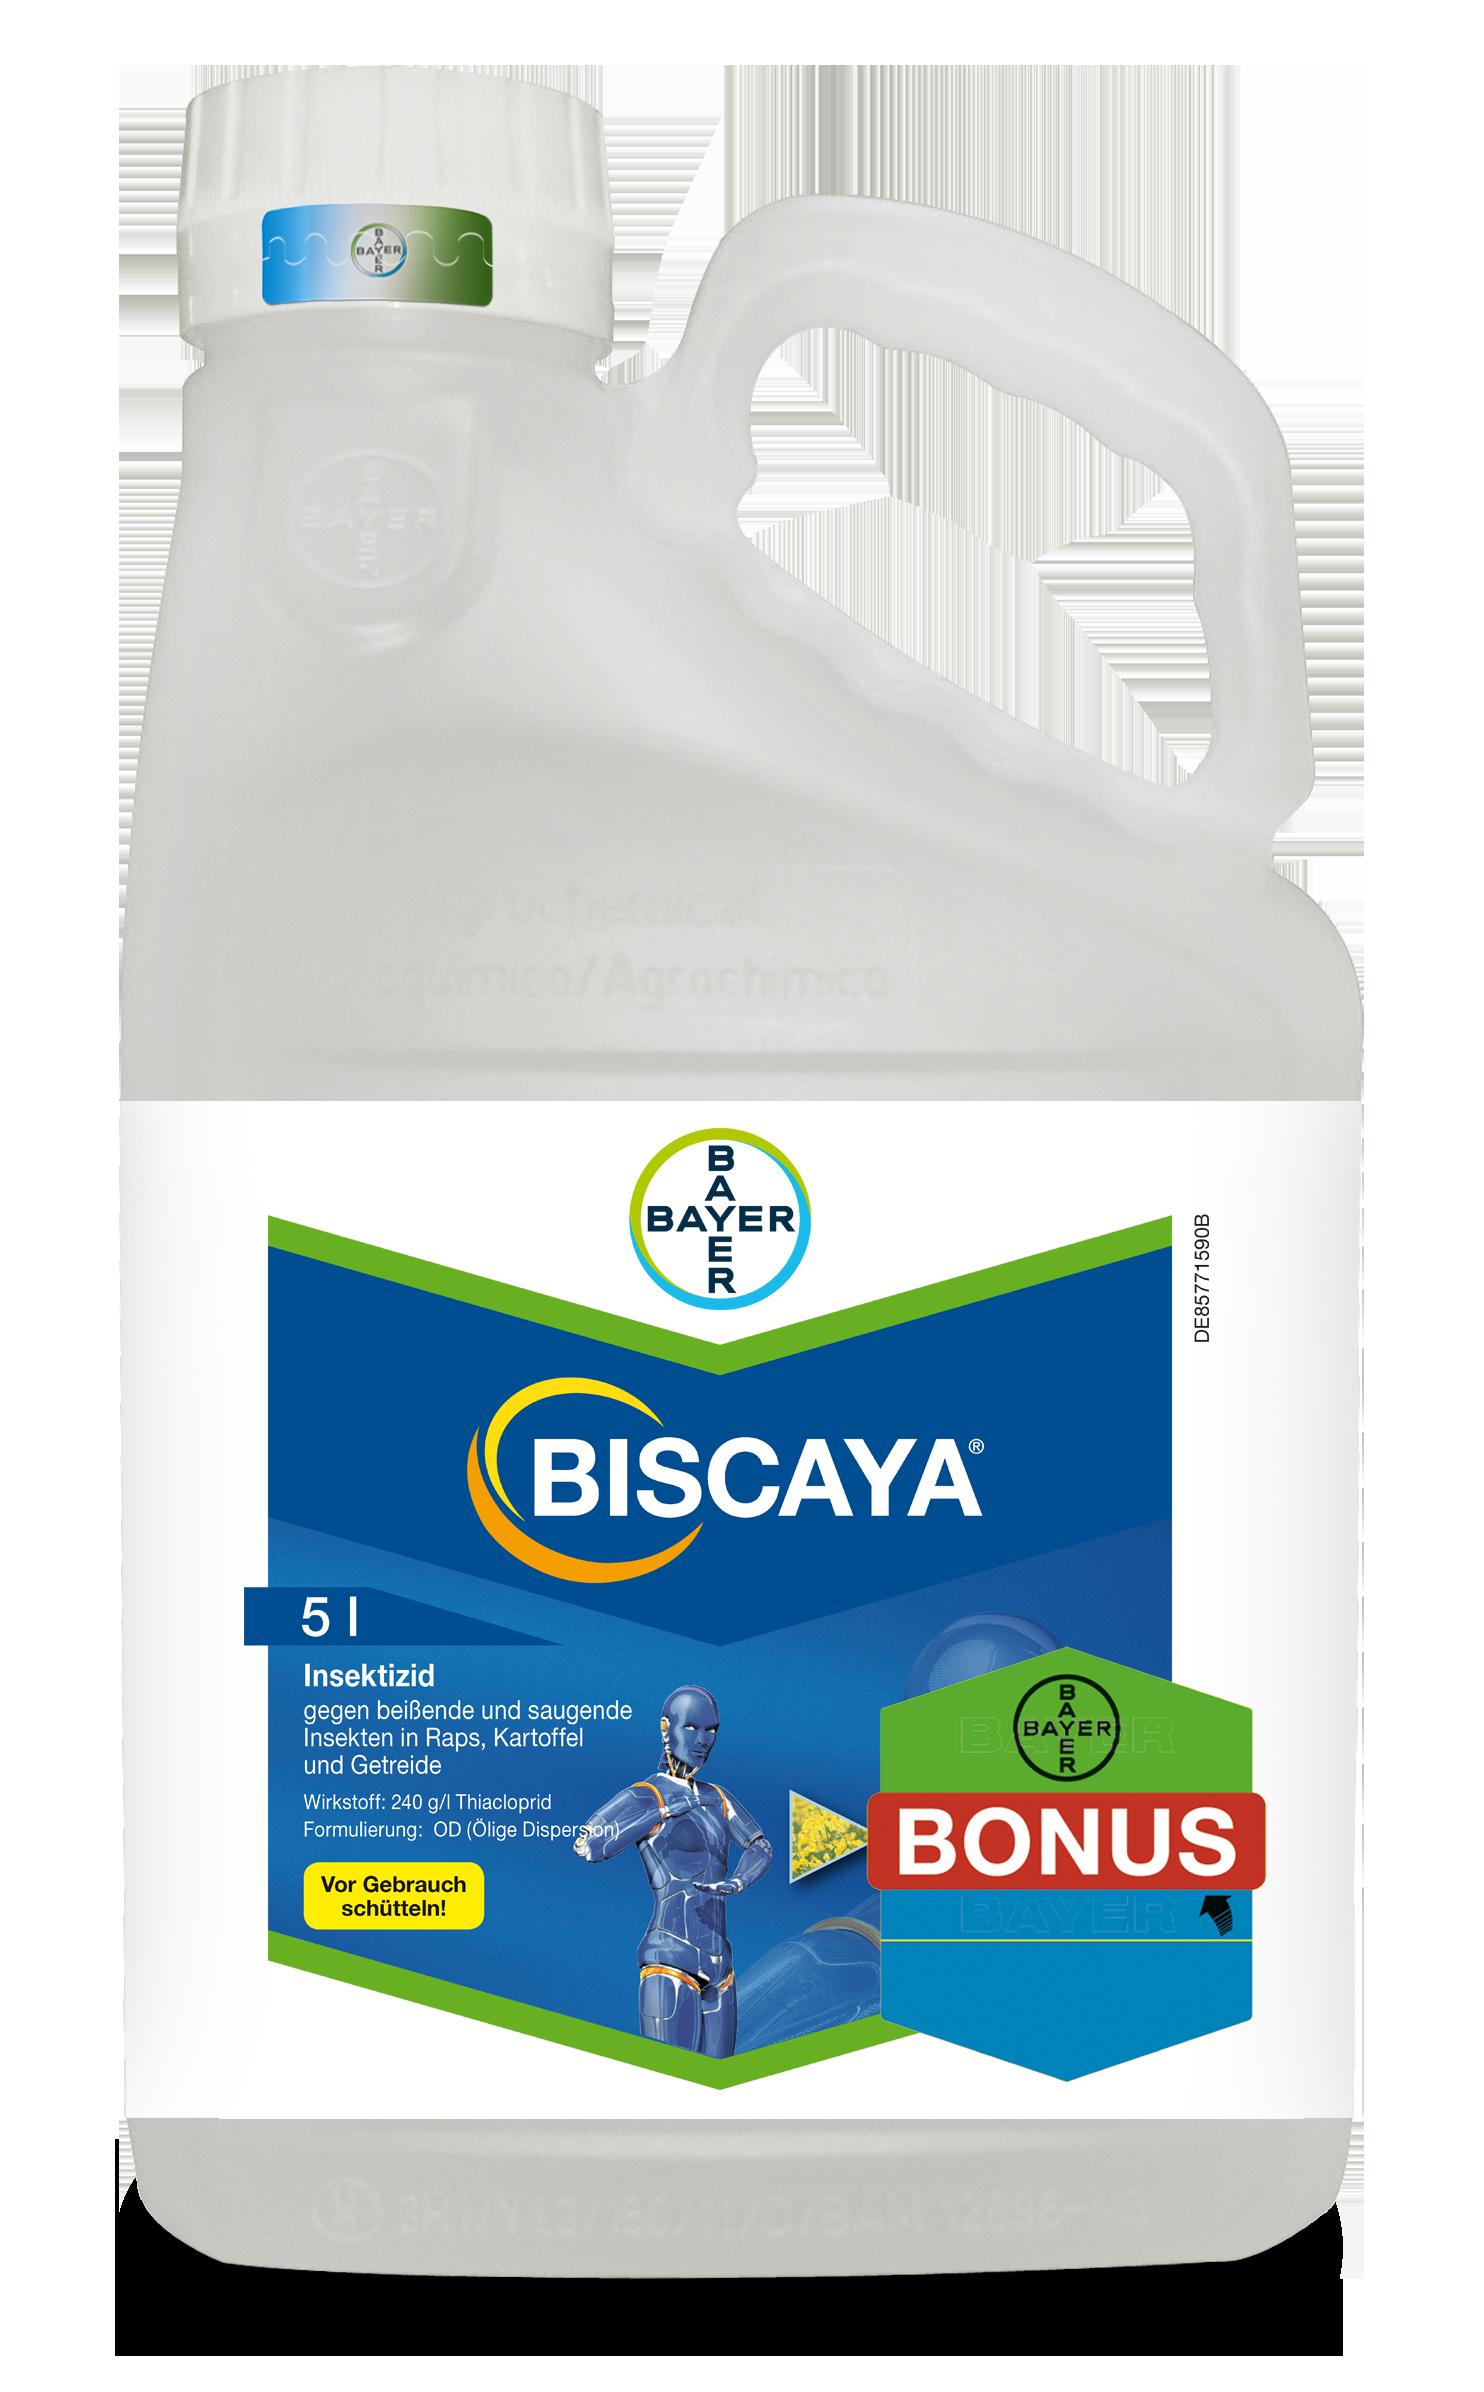 Biscaya®